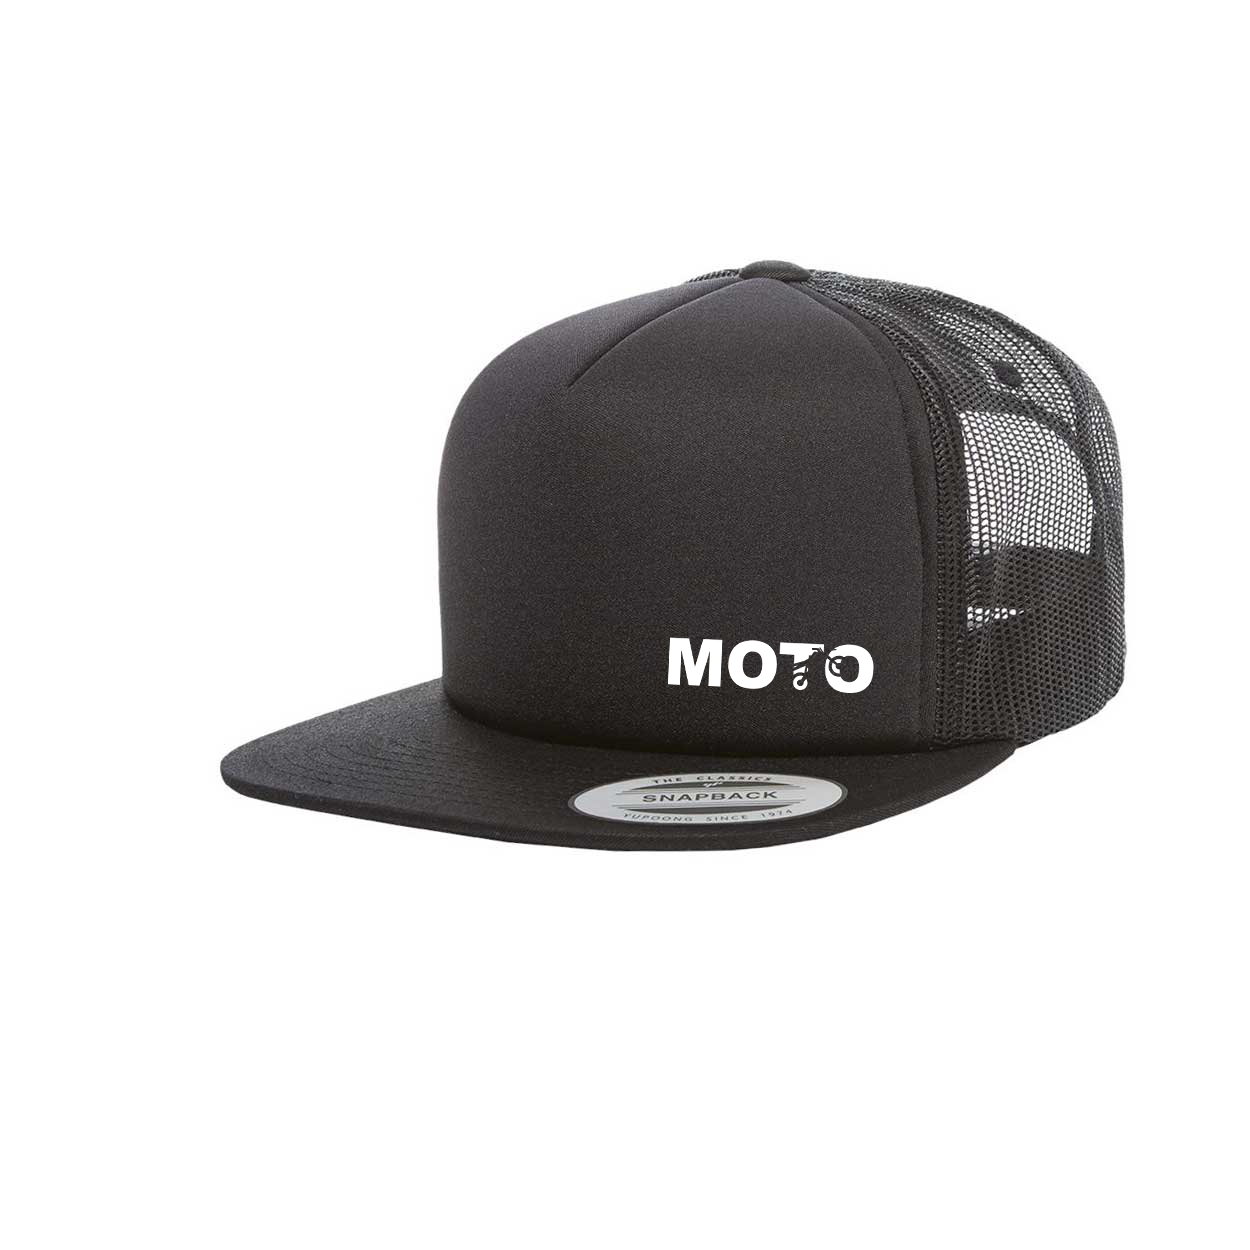 Moto Wheelie Logo Night Out Premium Foam Flat Brim Snapback Hat Black (White Logo)